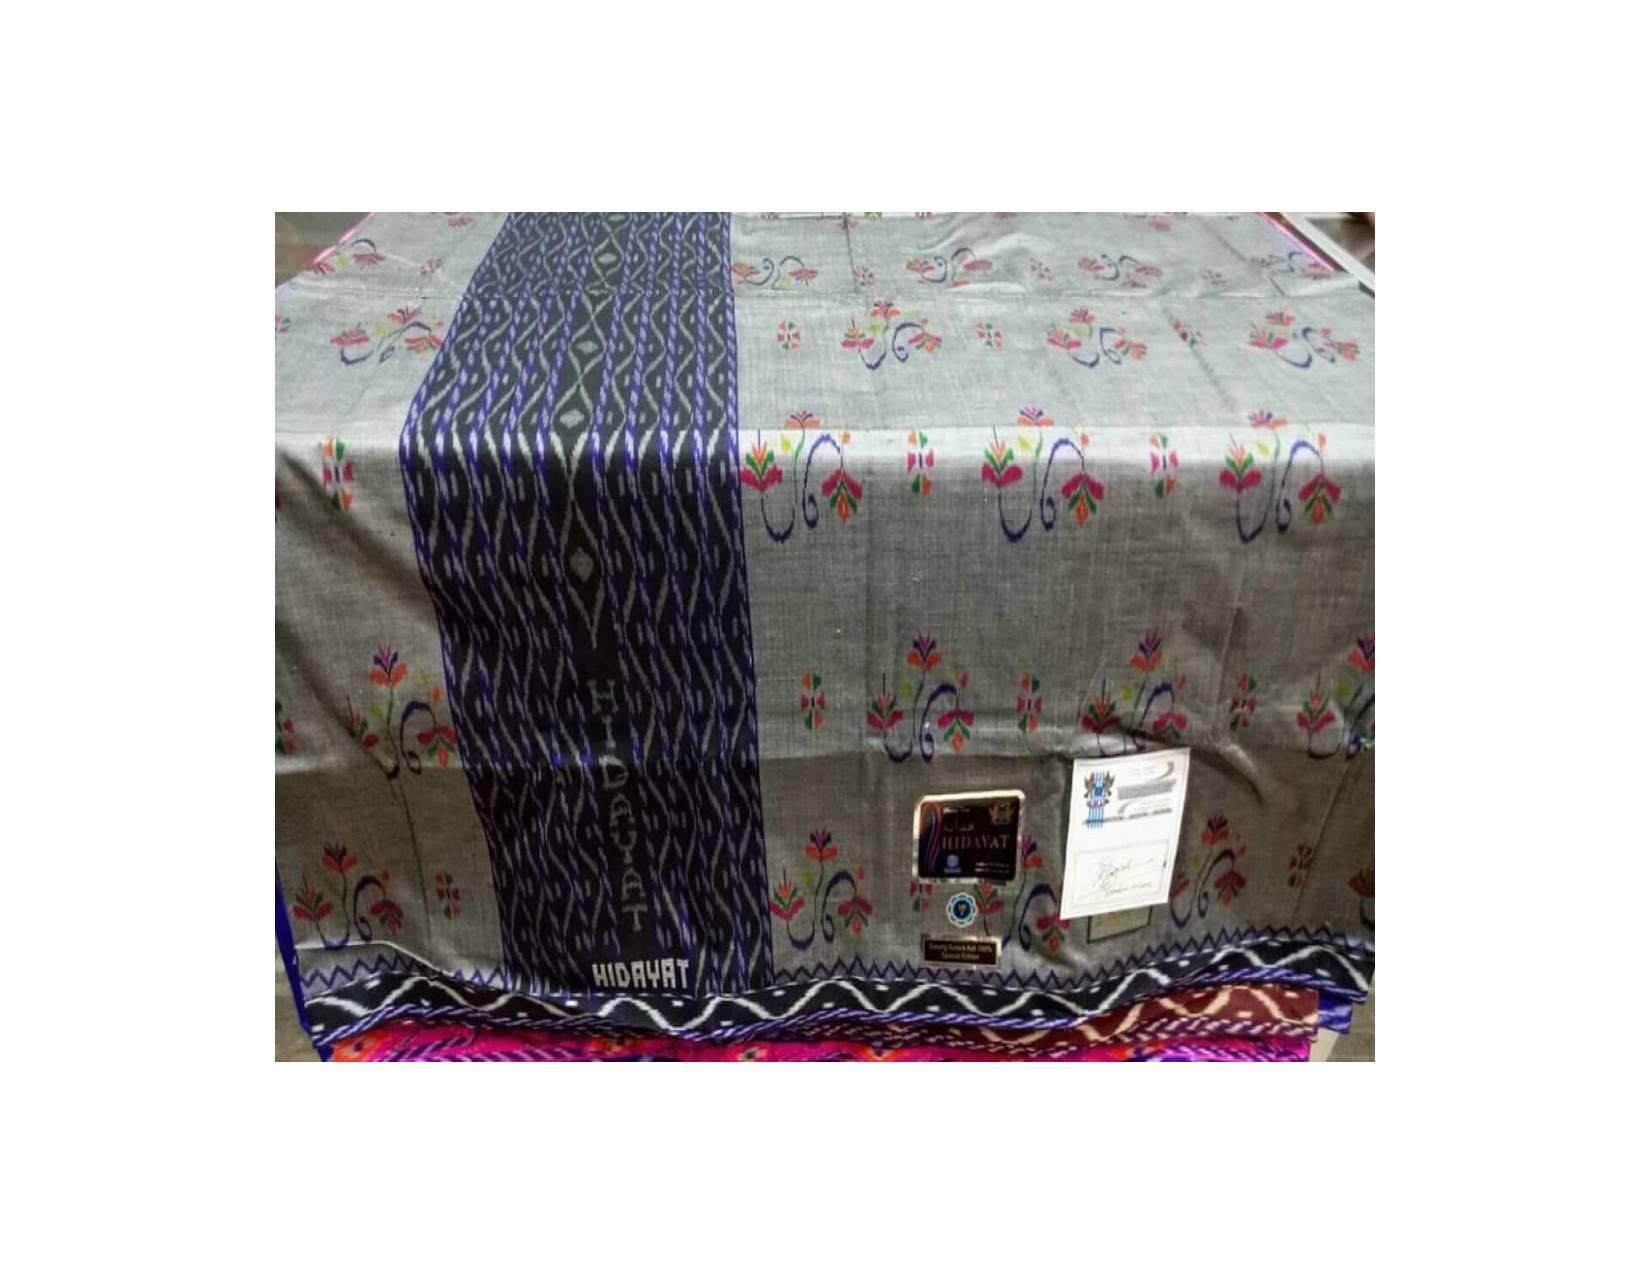 Sarung Tenun Sutra 210 Hidayat motif kembang diatas bhs mst kwg lamiya